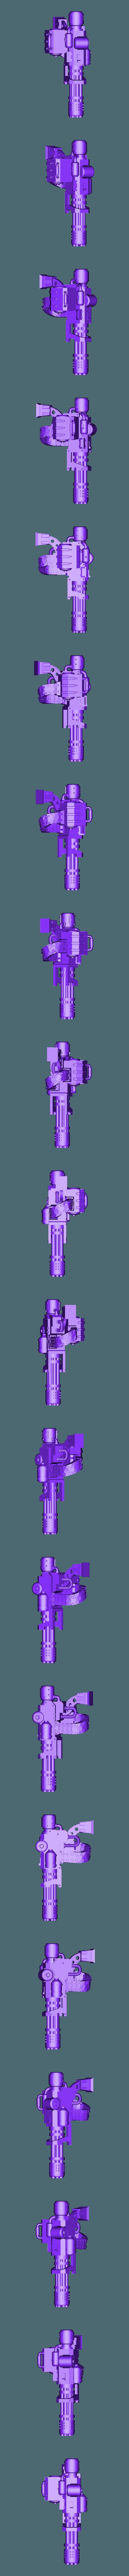 Chain_Gun__L_.stl Download free STL file Ultra Inquisitive and Super Pious Mega (and Slightly Insecure) Arachnid • 3D printer design, bentanweihao